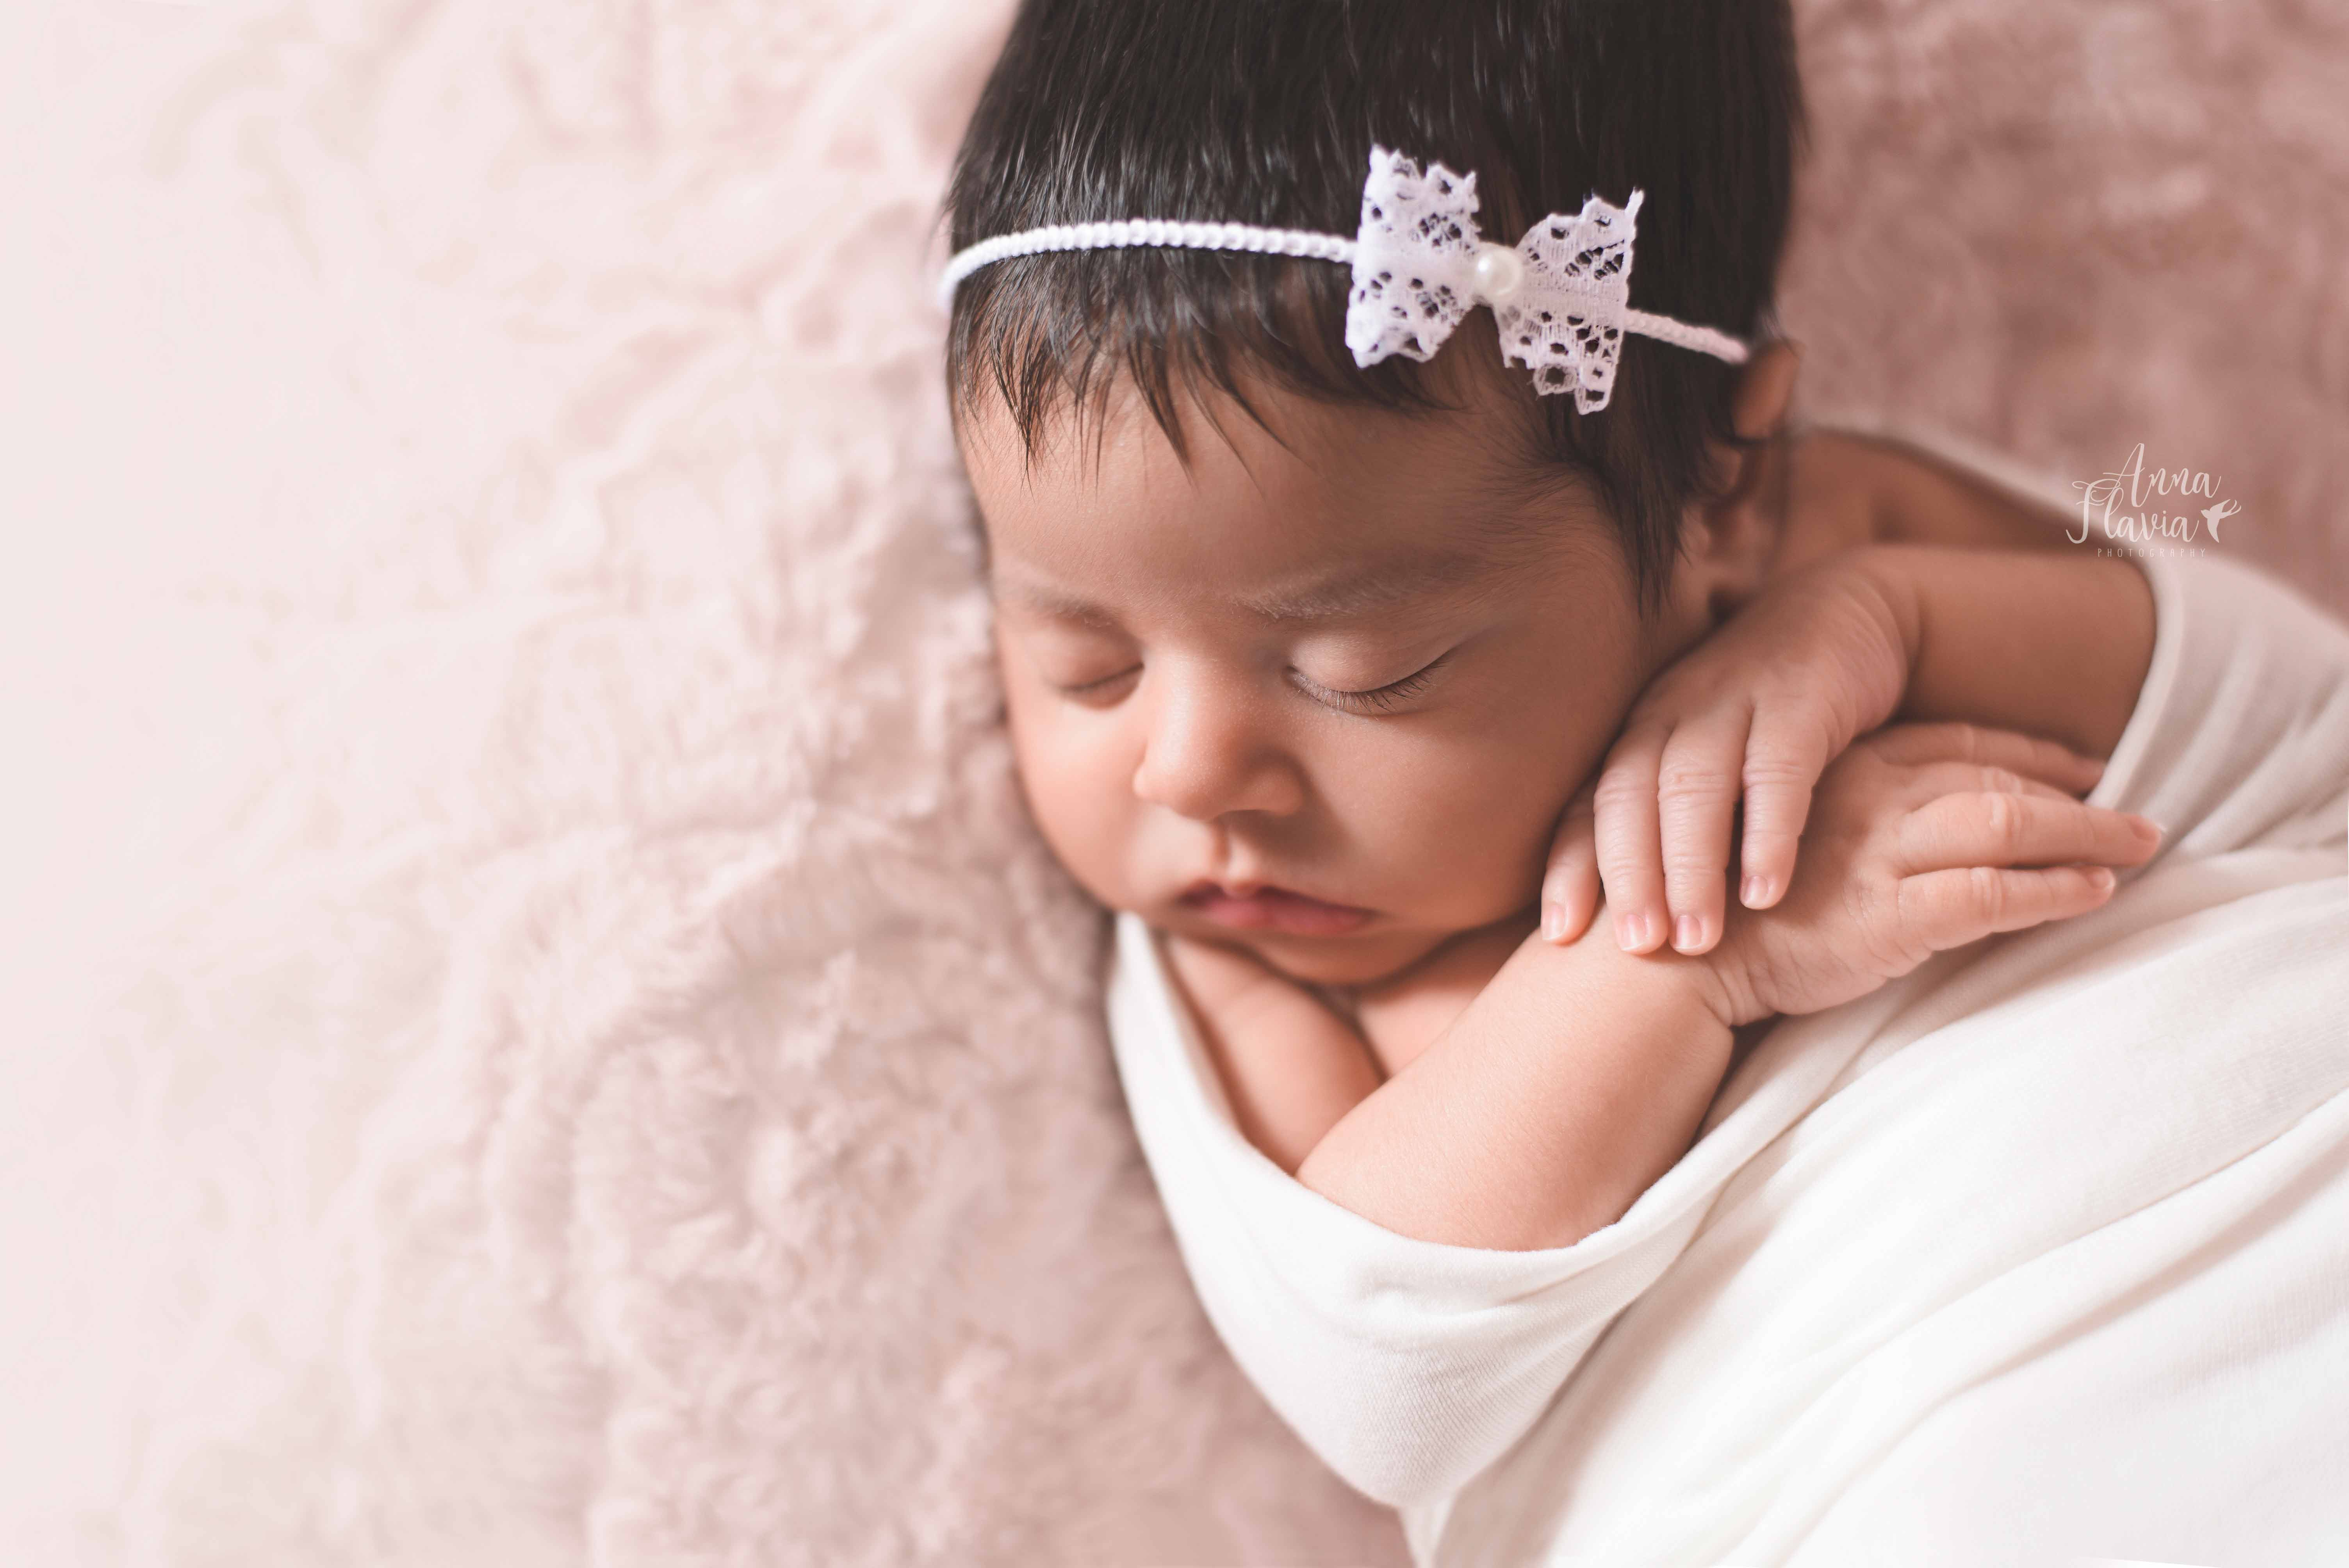 photographer_dublin_anna_flavia_newborn_maternity_3